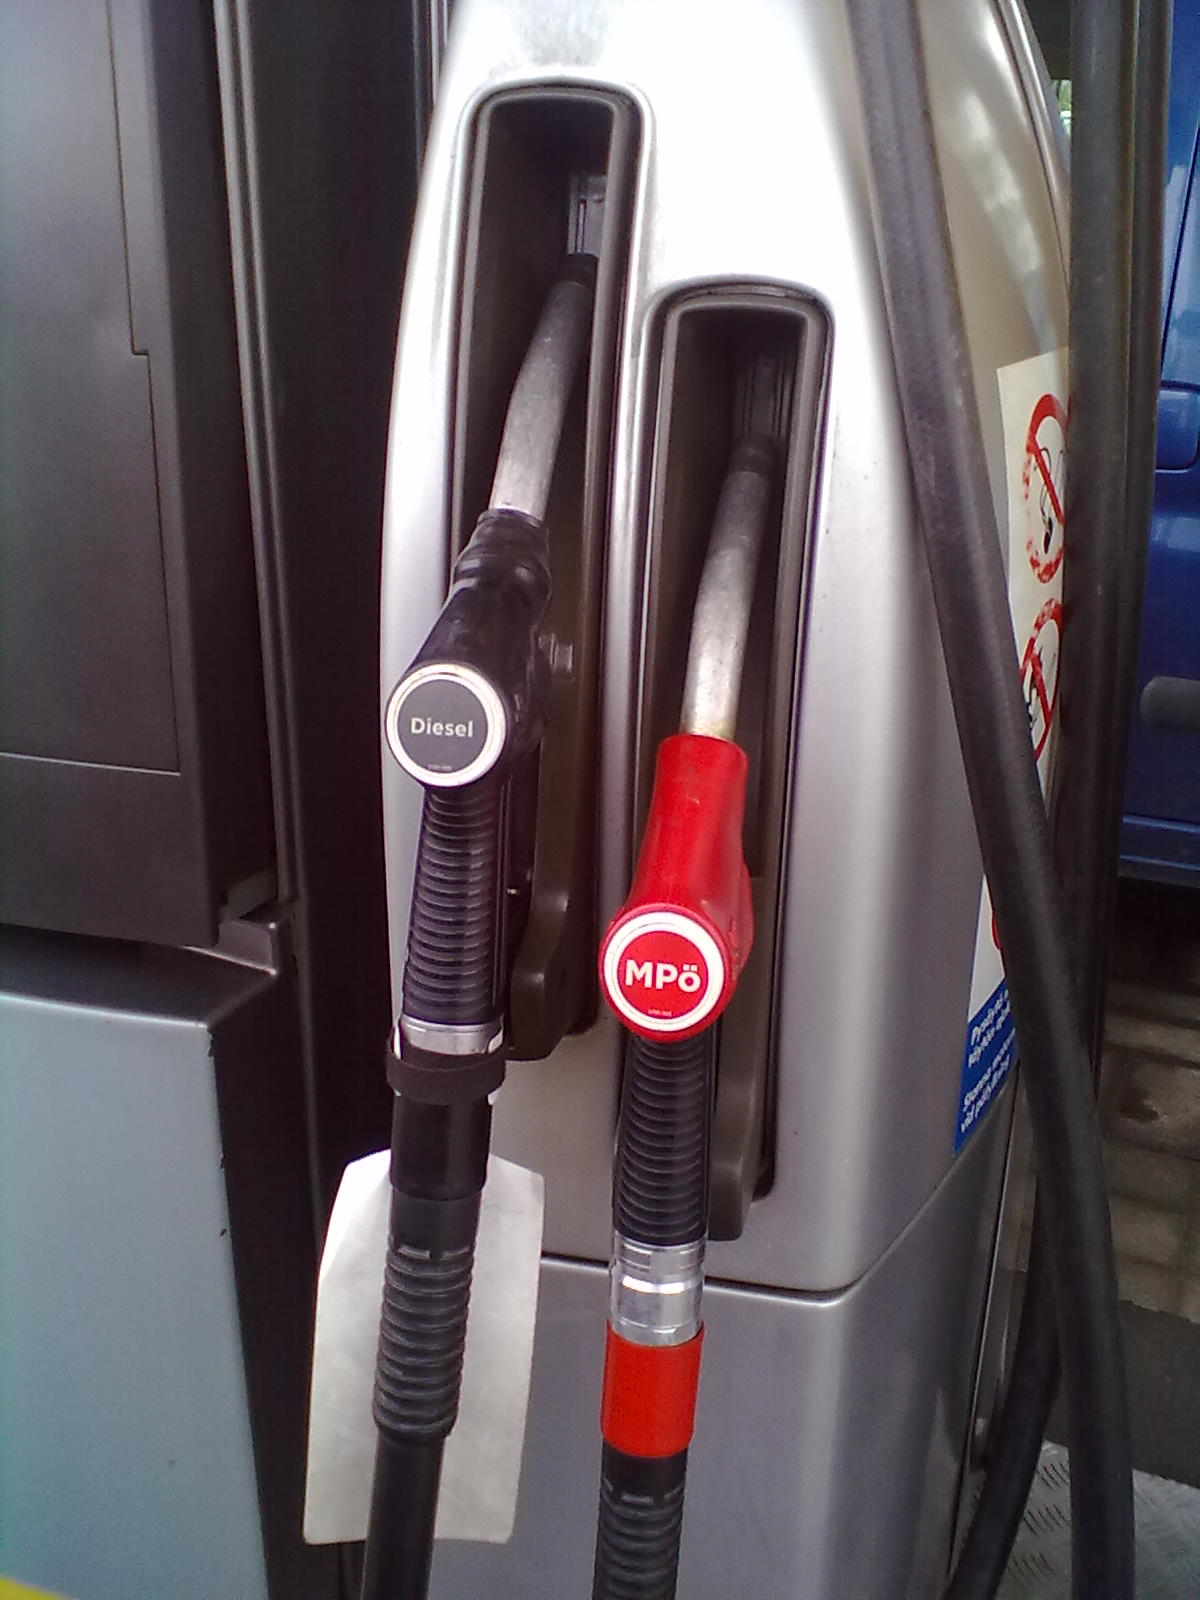 Diesel fuel pumps, Self-published work